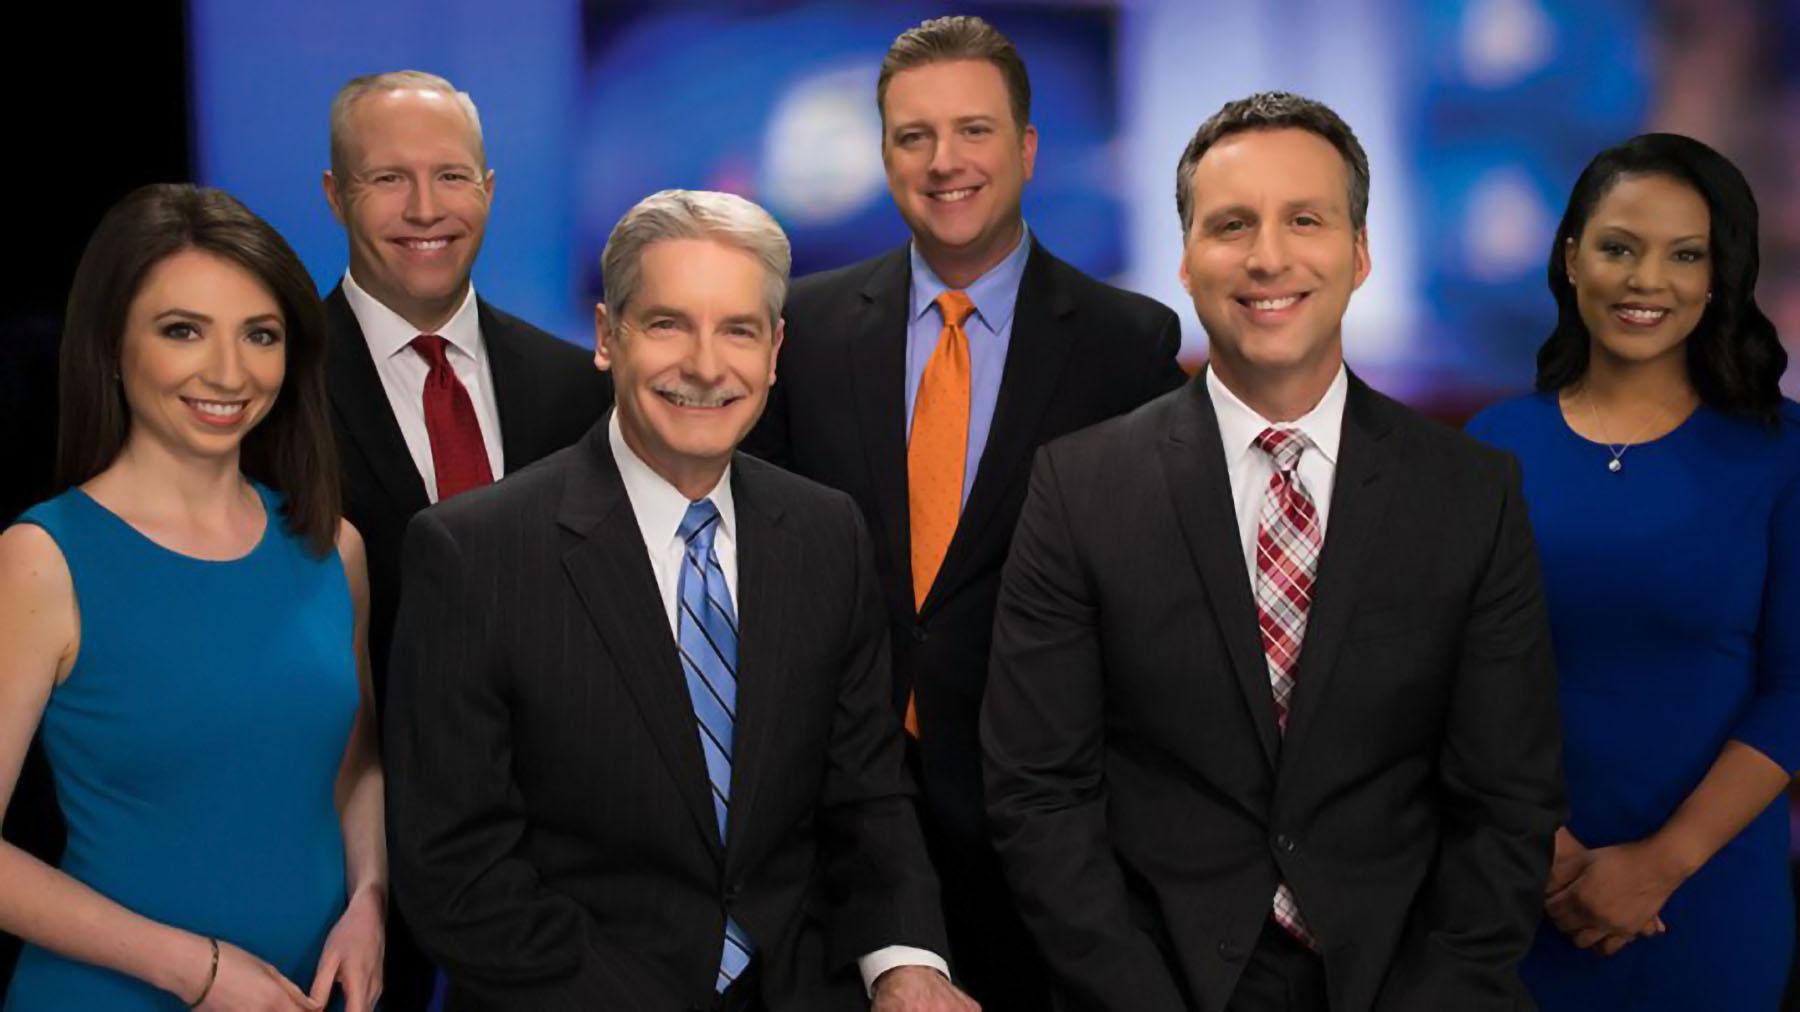 NCB 5 News Team